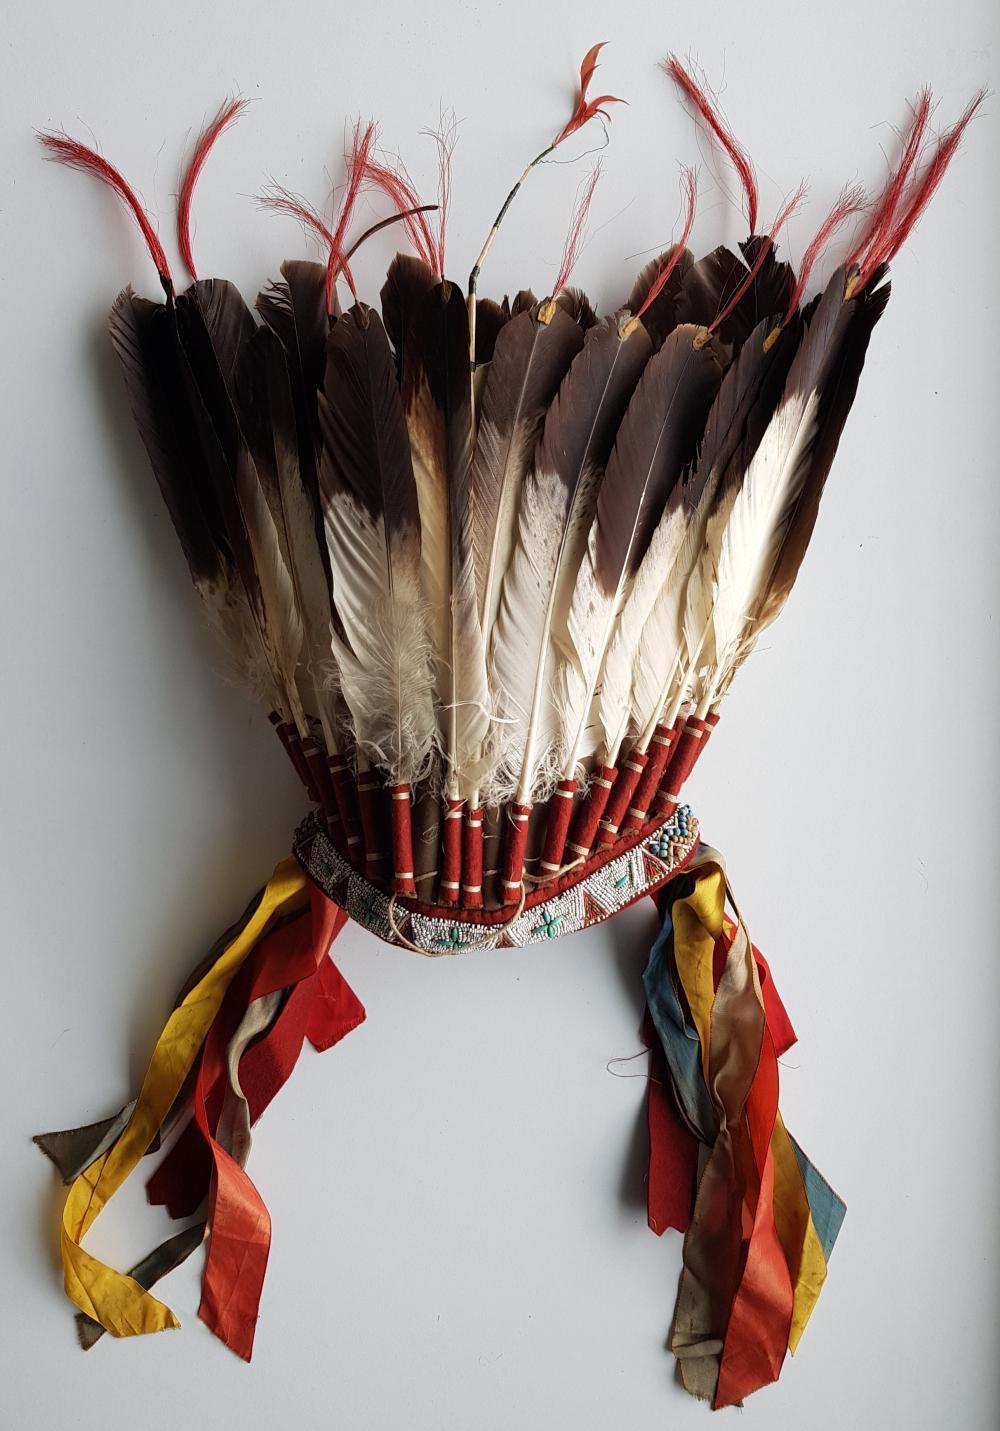 La Remise Aux Tissus Lyon hairdressing of 26 eagle feathers 1950